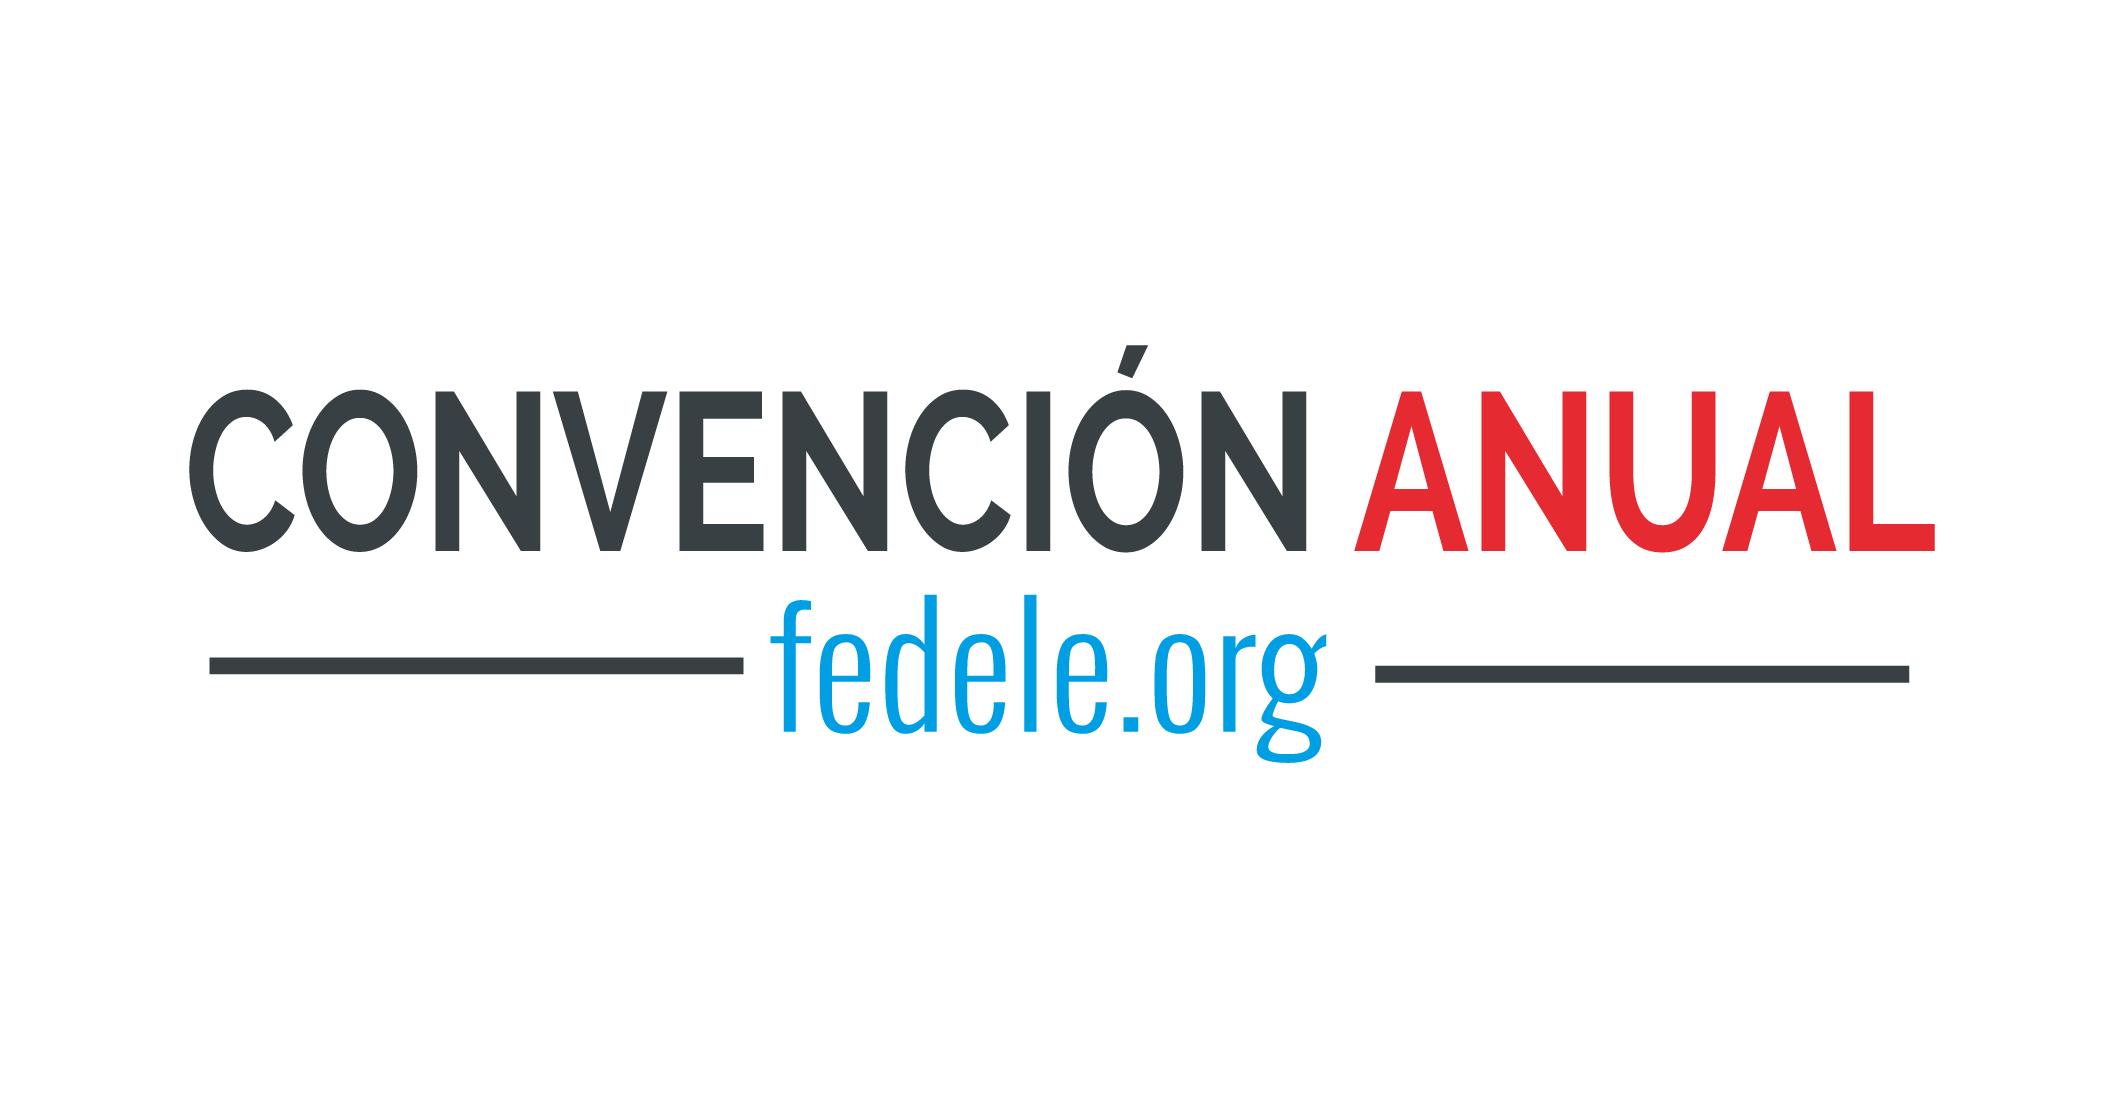 convencion anual fedele logo